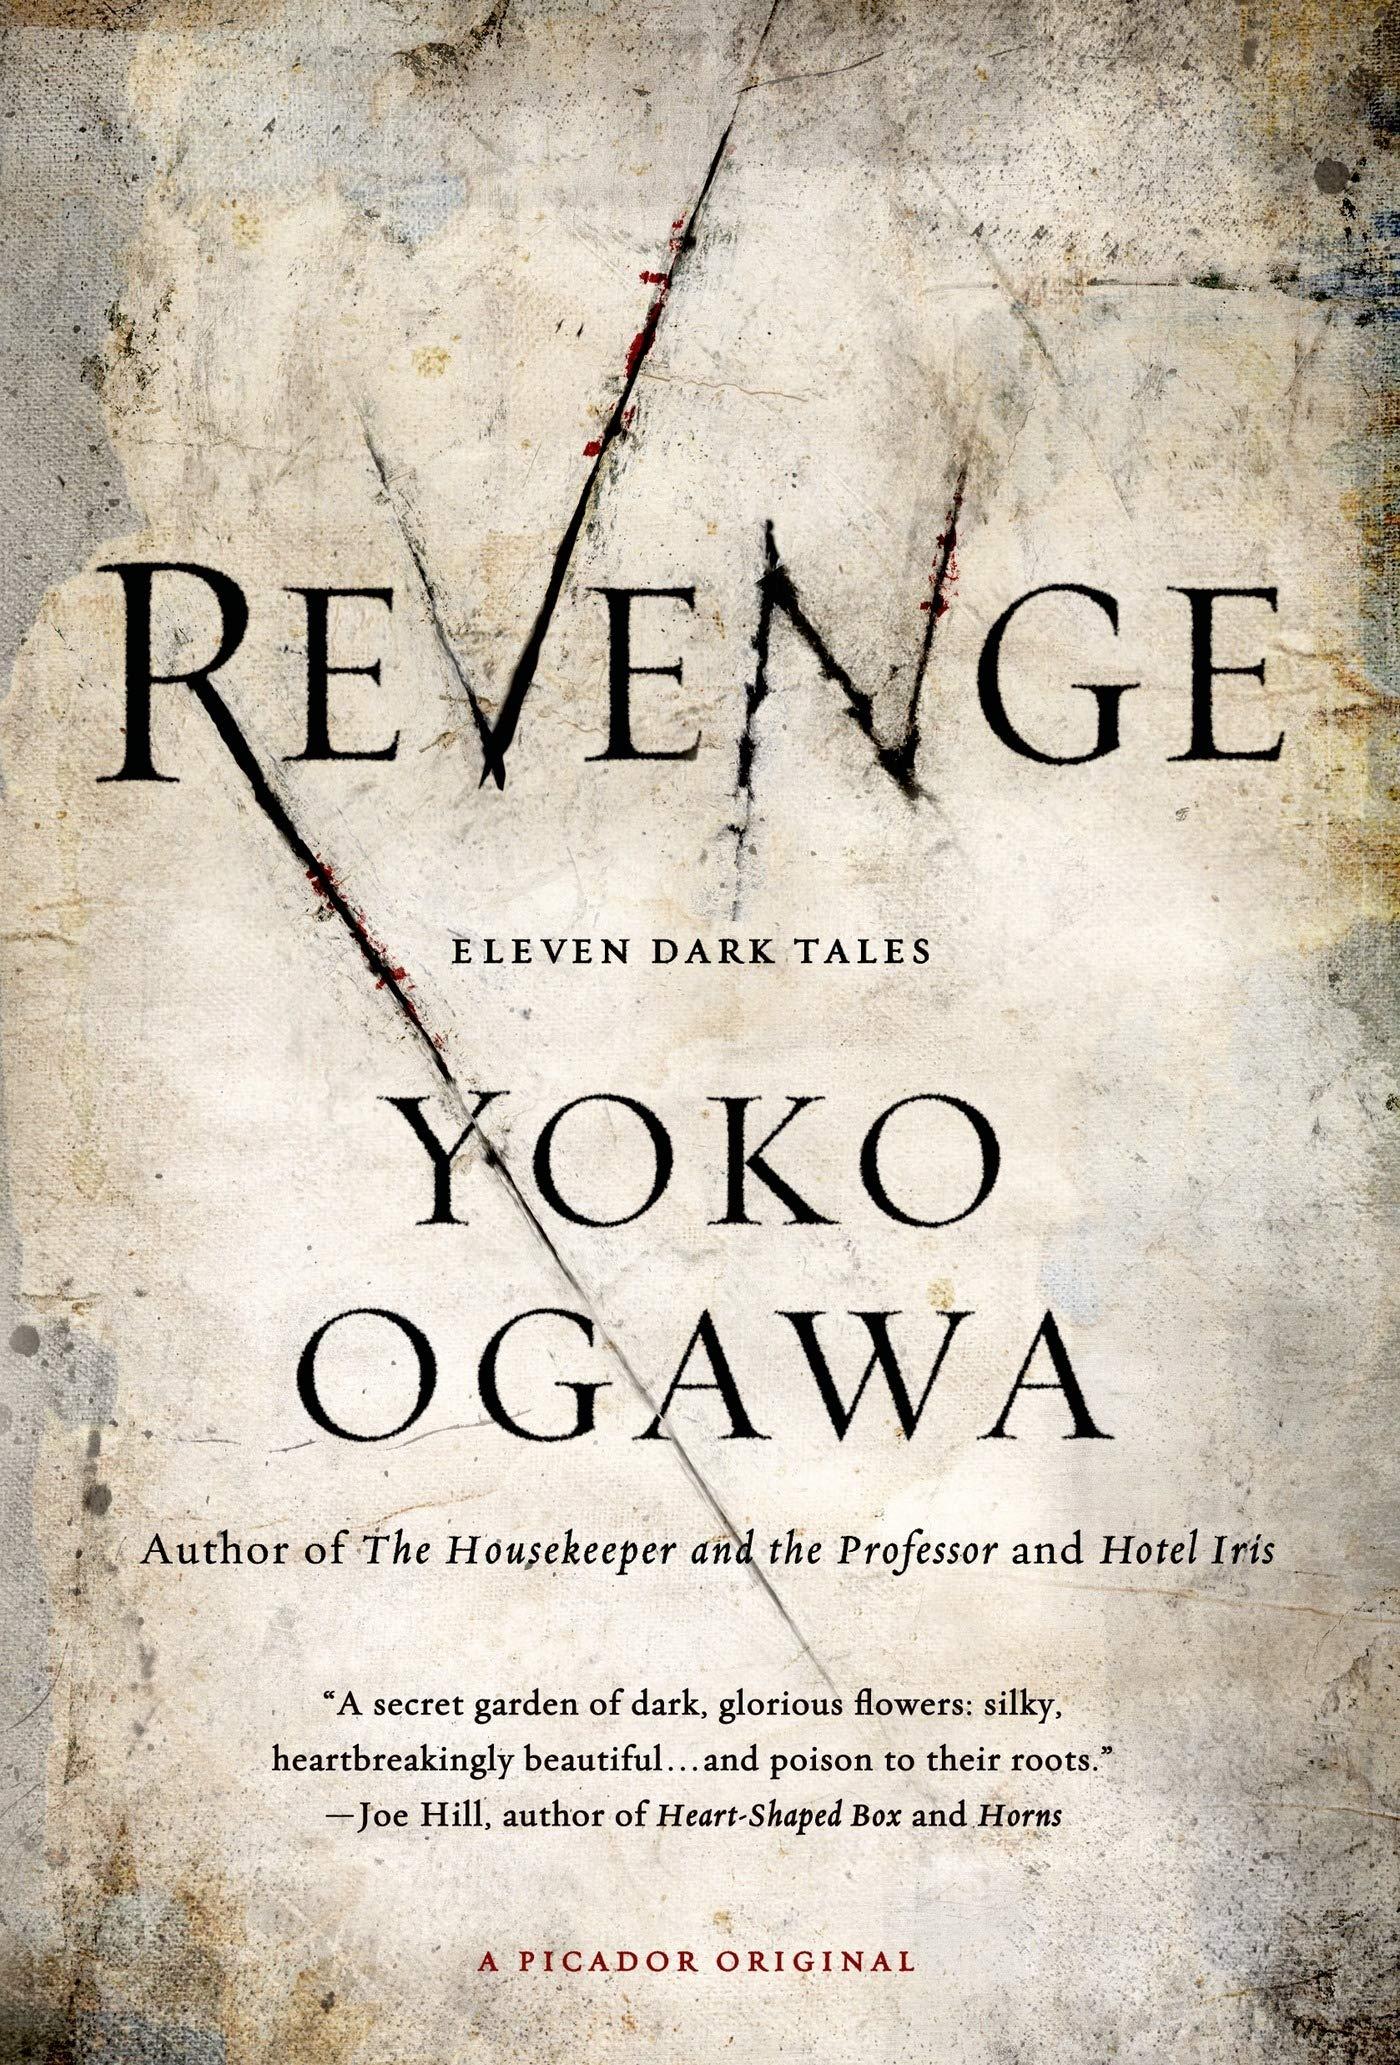 Museum of Torture: Yoko Ogawa's Revenge - Slant Magazine